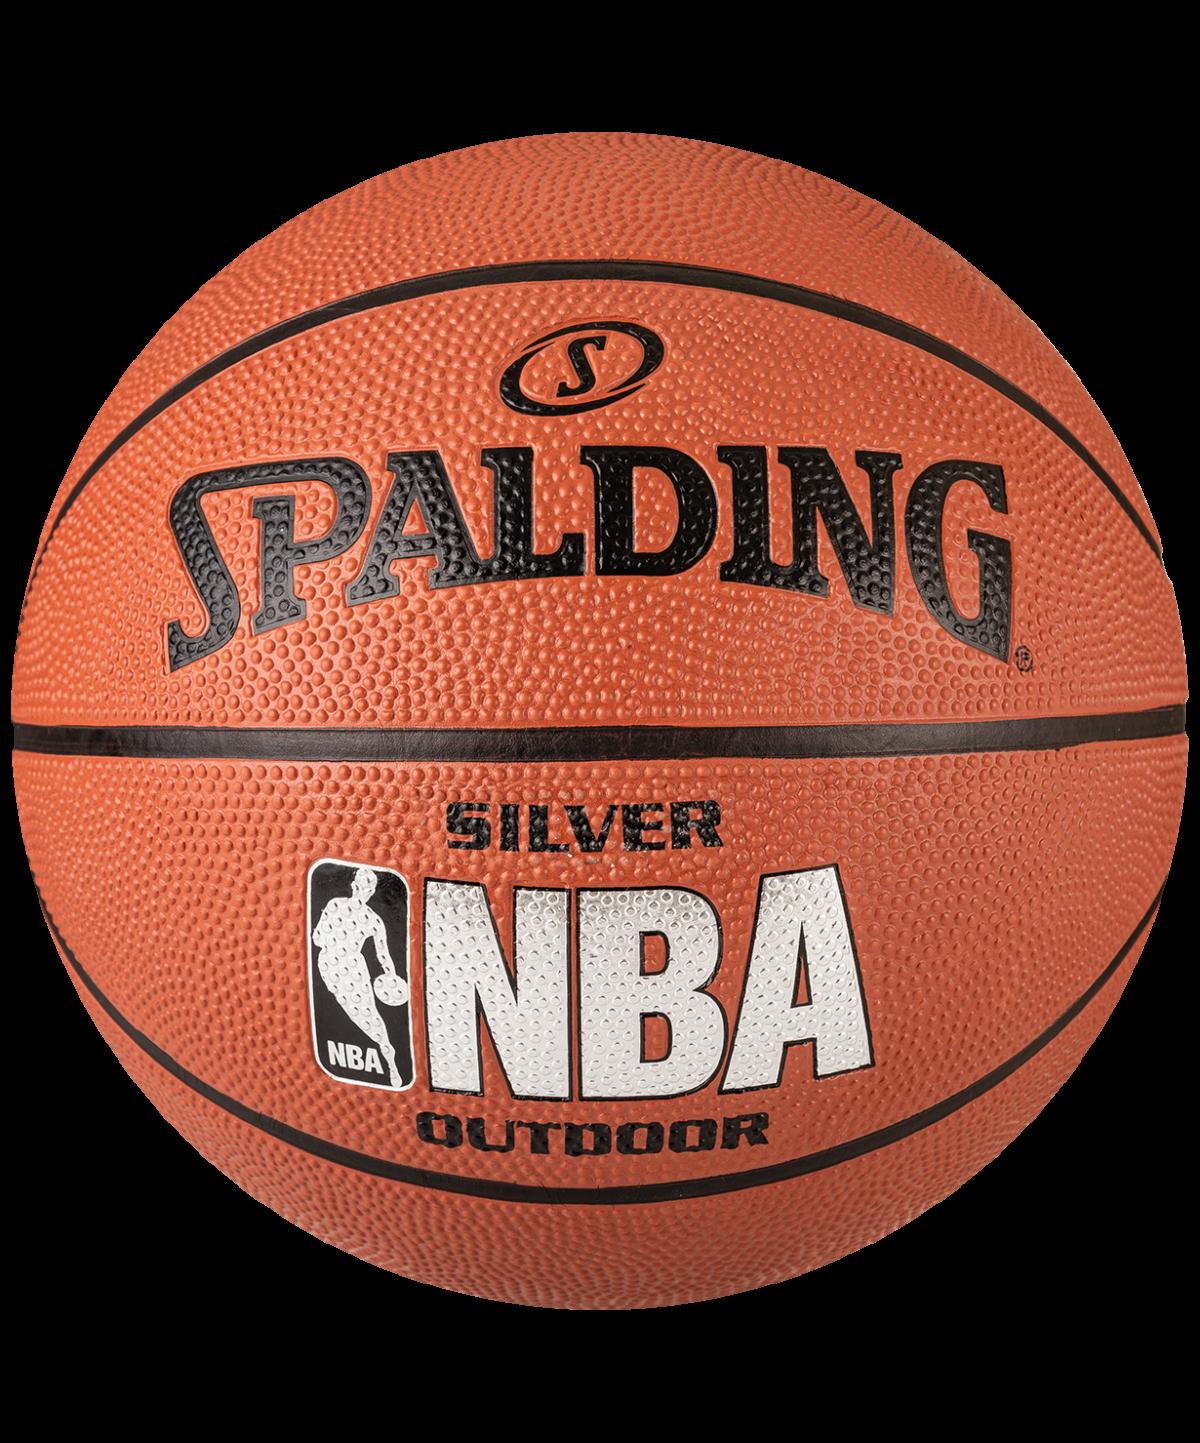 SPALDING NBA Silver Мяч баскетбольный  83014Z №5 - 1